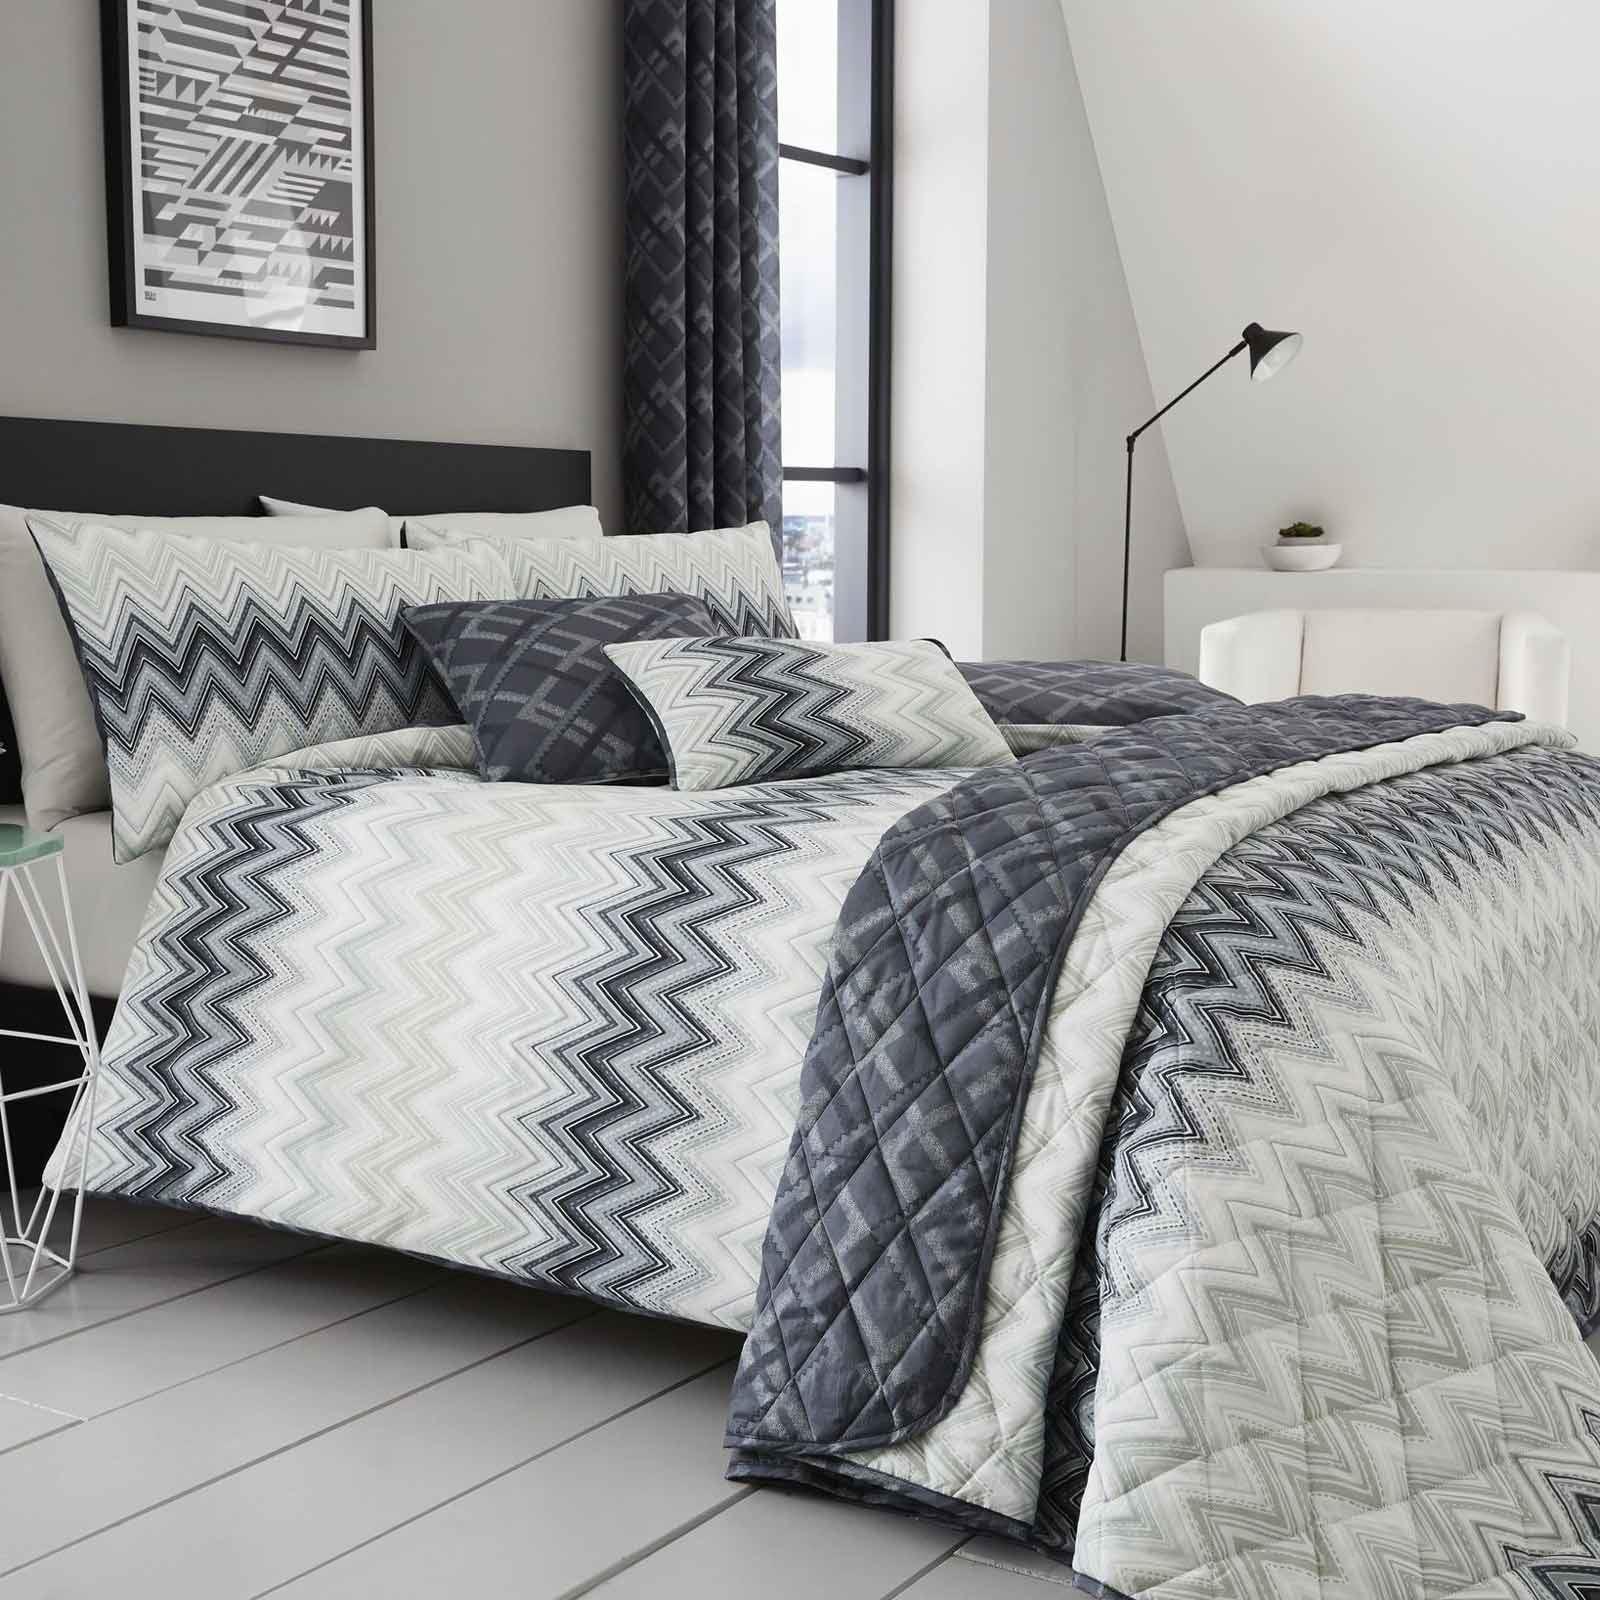 ombre luxury duvet covers geometric chevron bedding. Black Bedroom Furniture Sets. Home Design Ideas